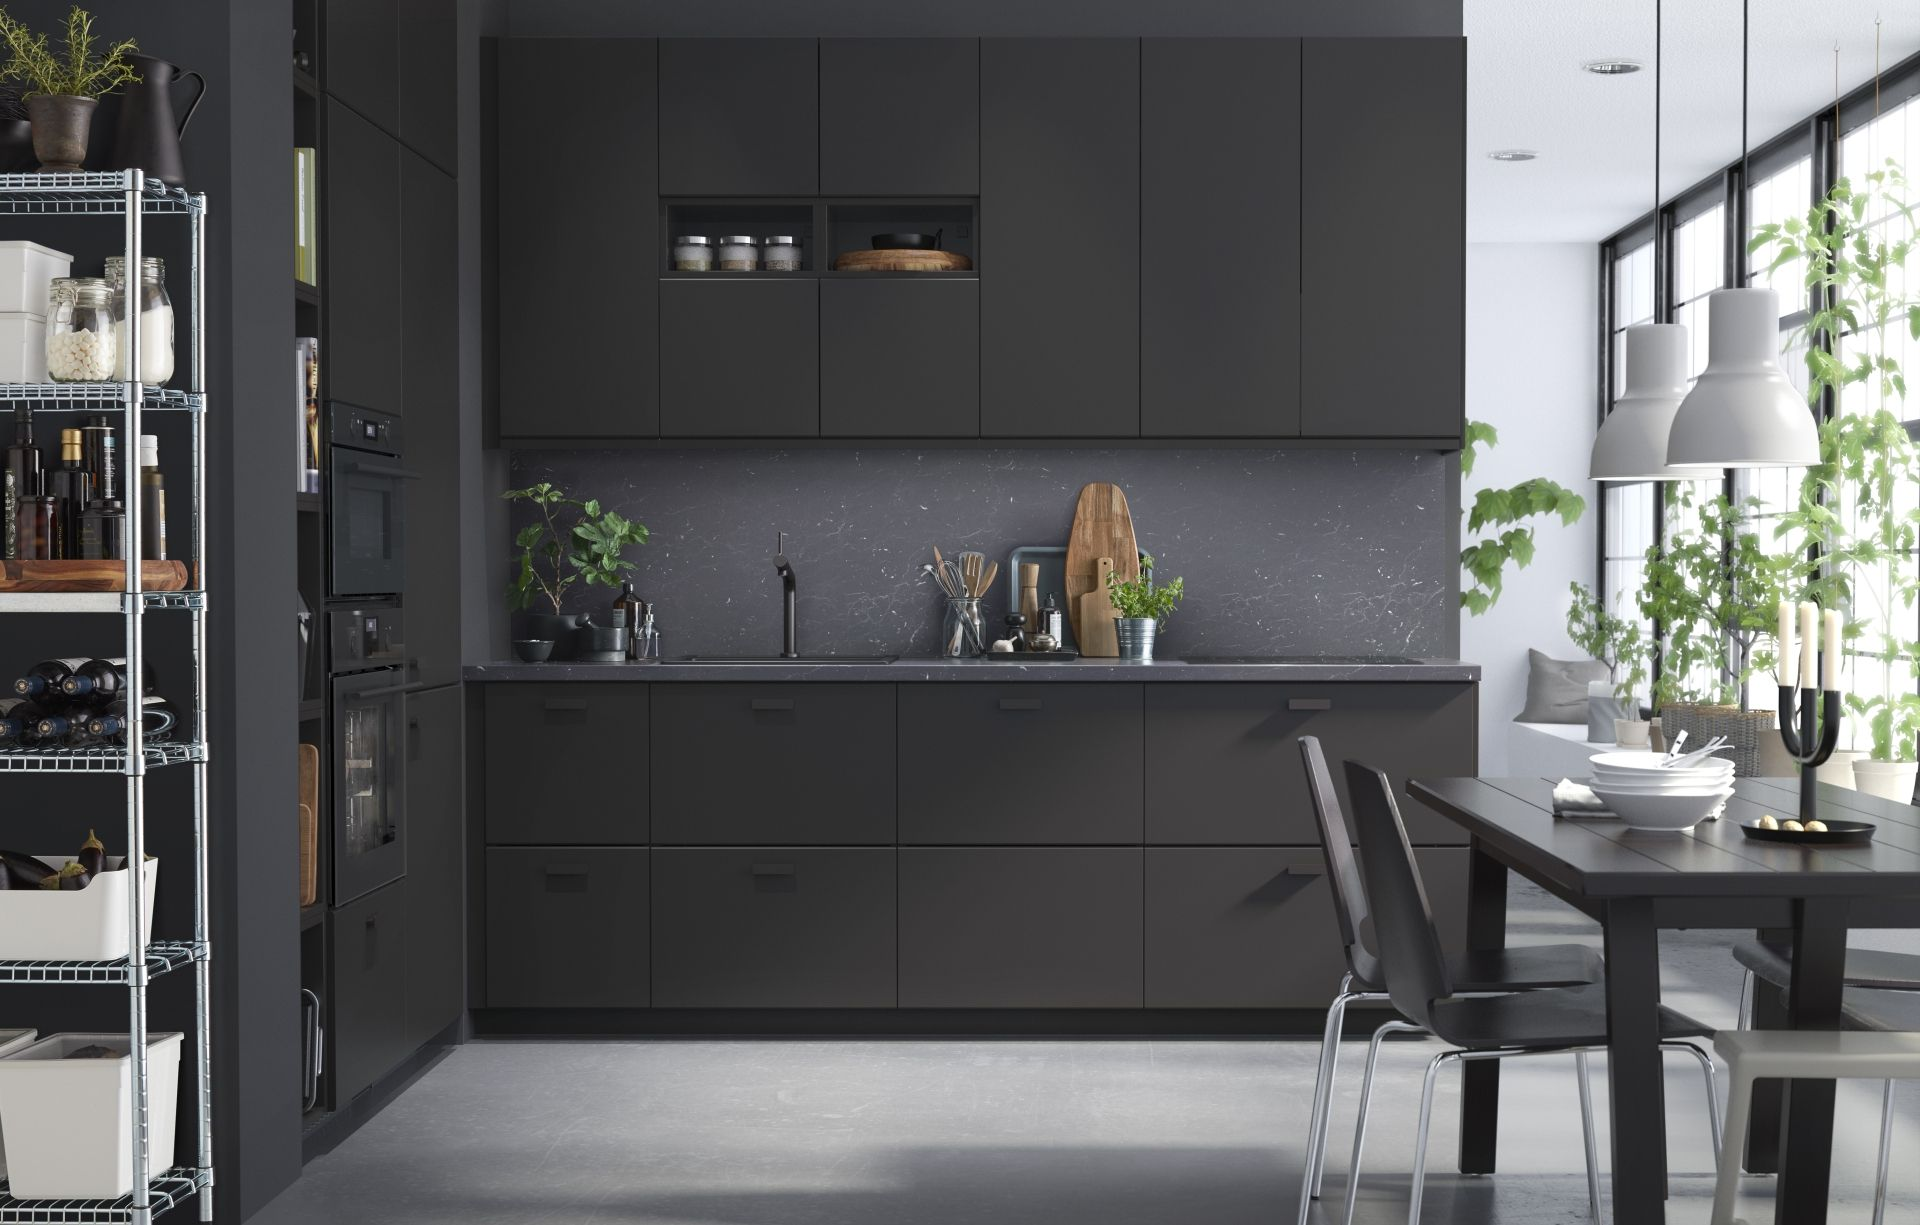 Zwart Keuken Kvik : Keuken kvik kvik keukens prijs uniek l keuken good lkeuken van